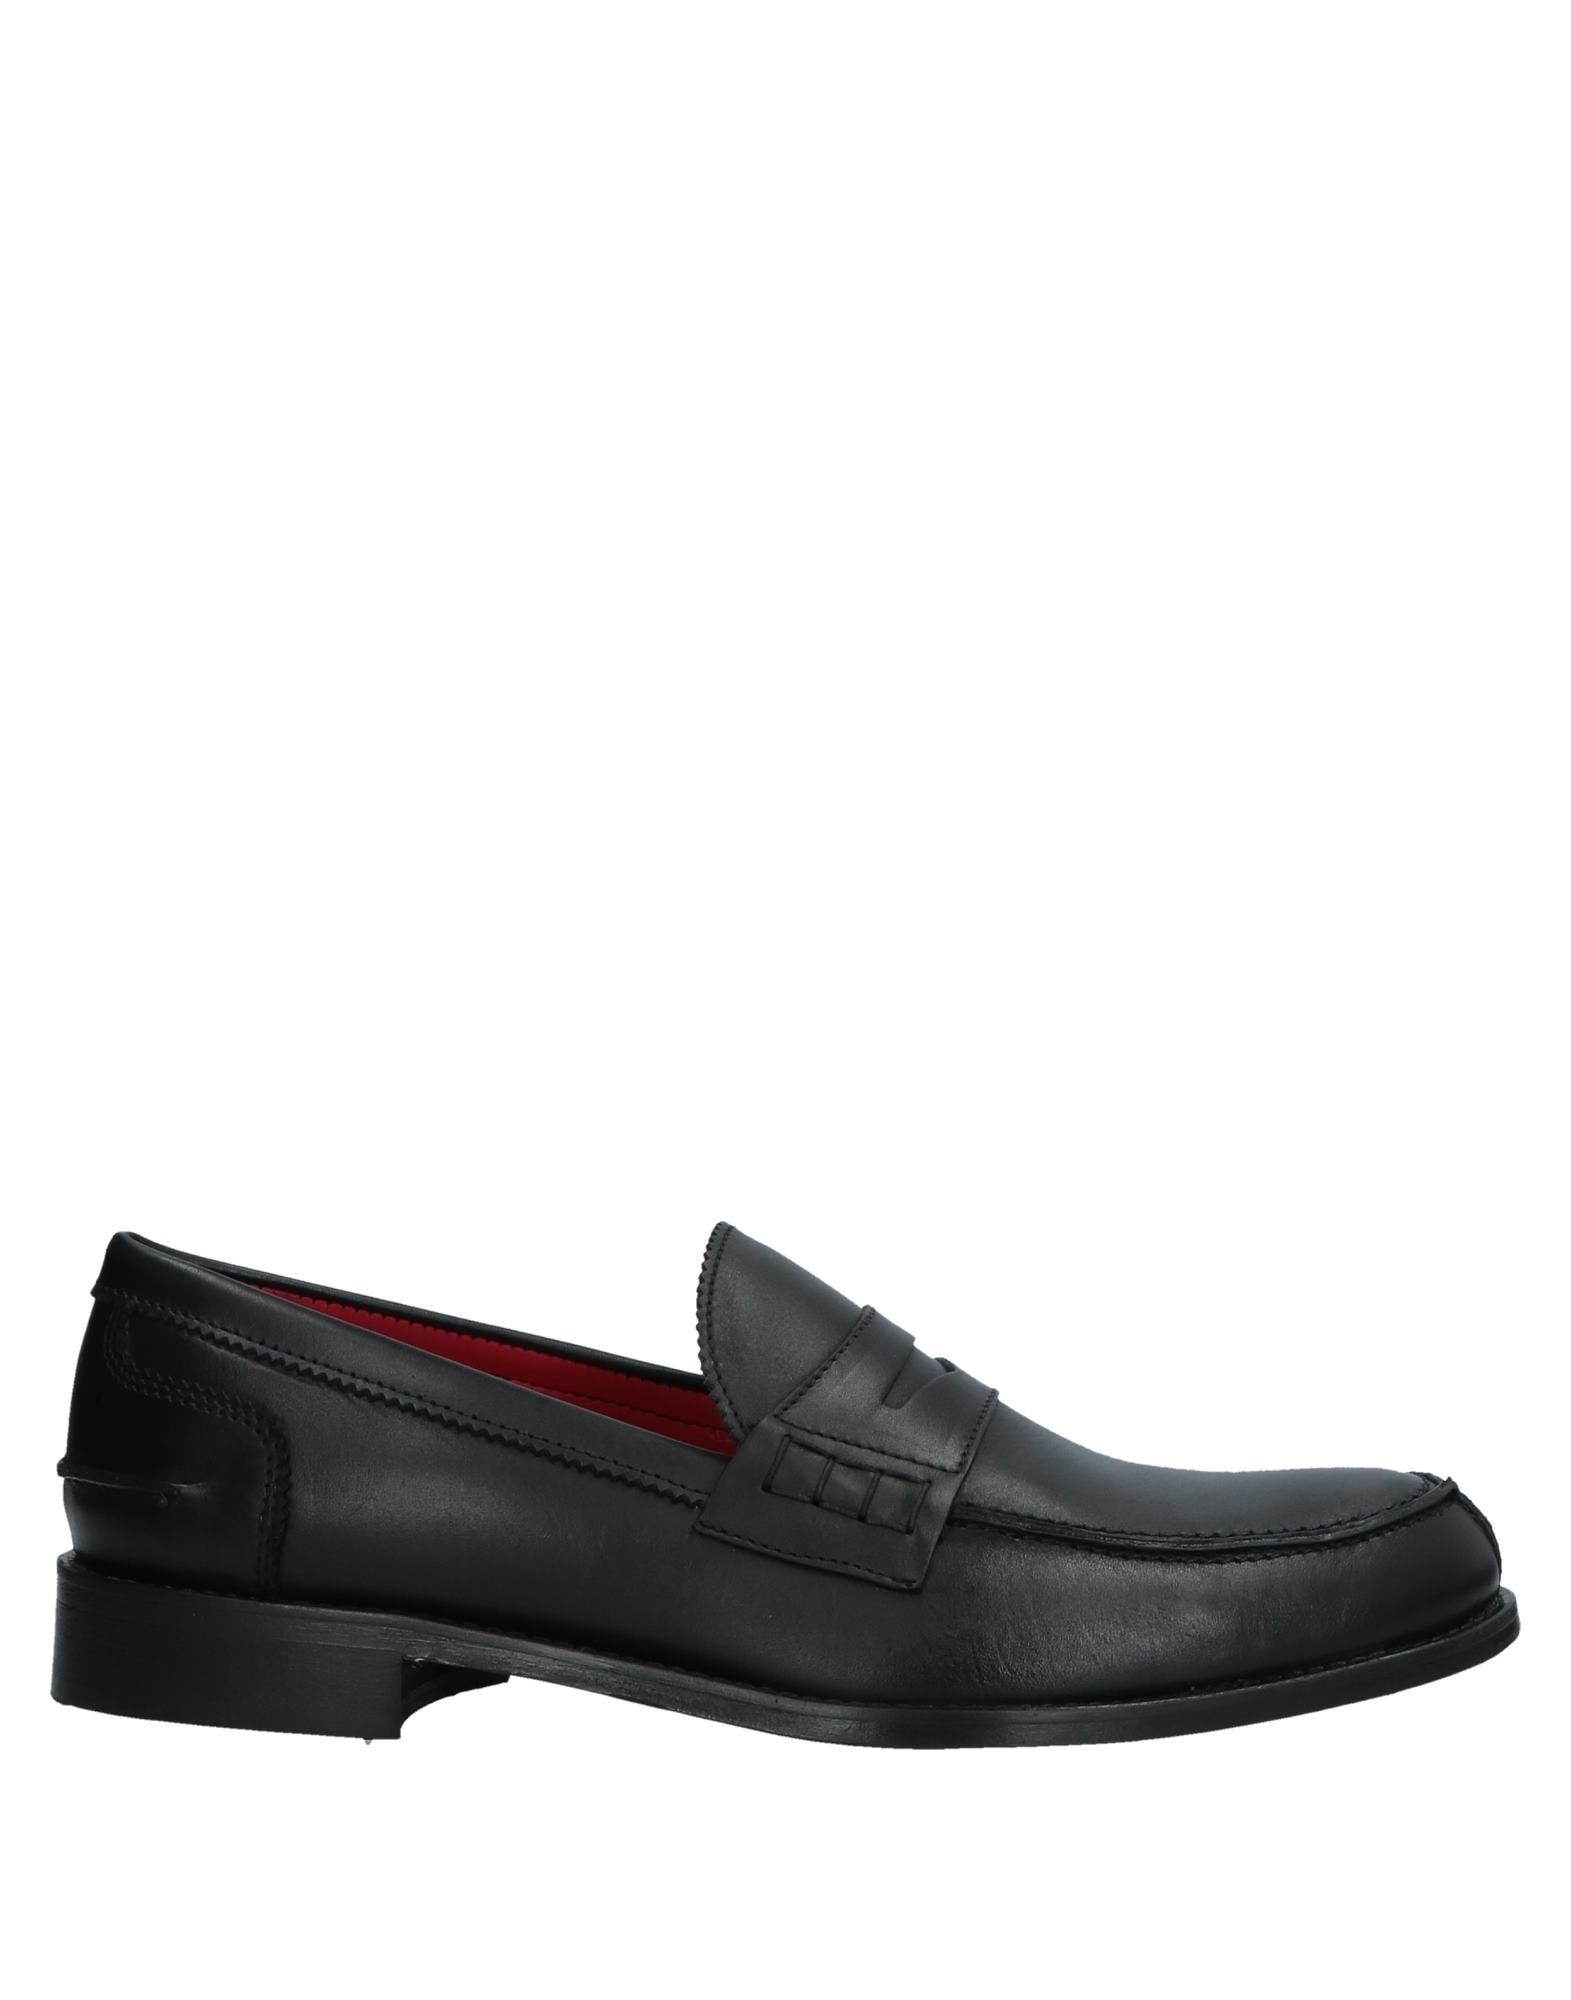 Bruno Magli Gute Mokassins Herren  11571283NA Gute Magli Qualität beliebte Schuhe a64d72